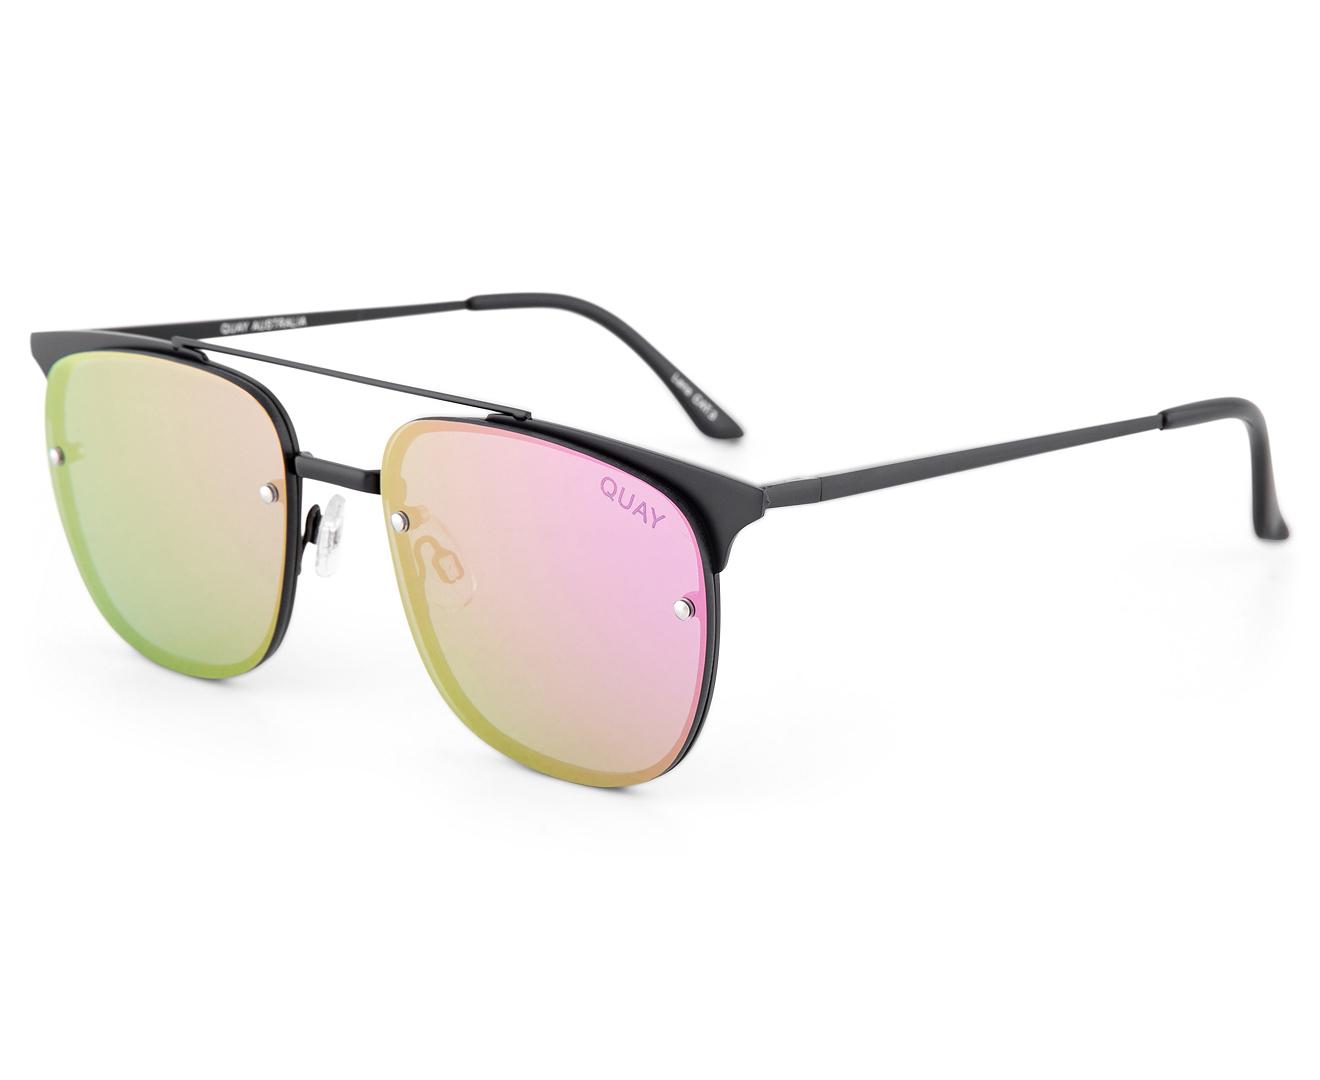 83d781d062 Quay Australia Women s Rimless Private Eyes Sunglasses - Black Purple